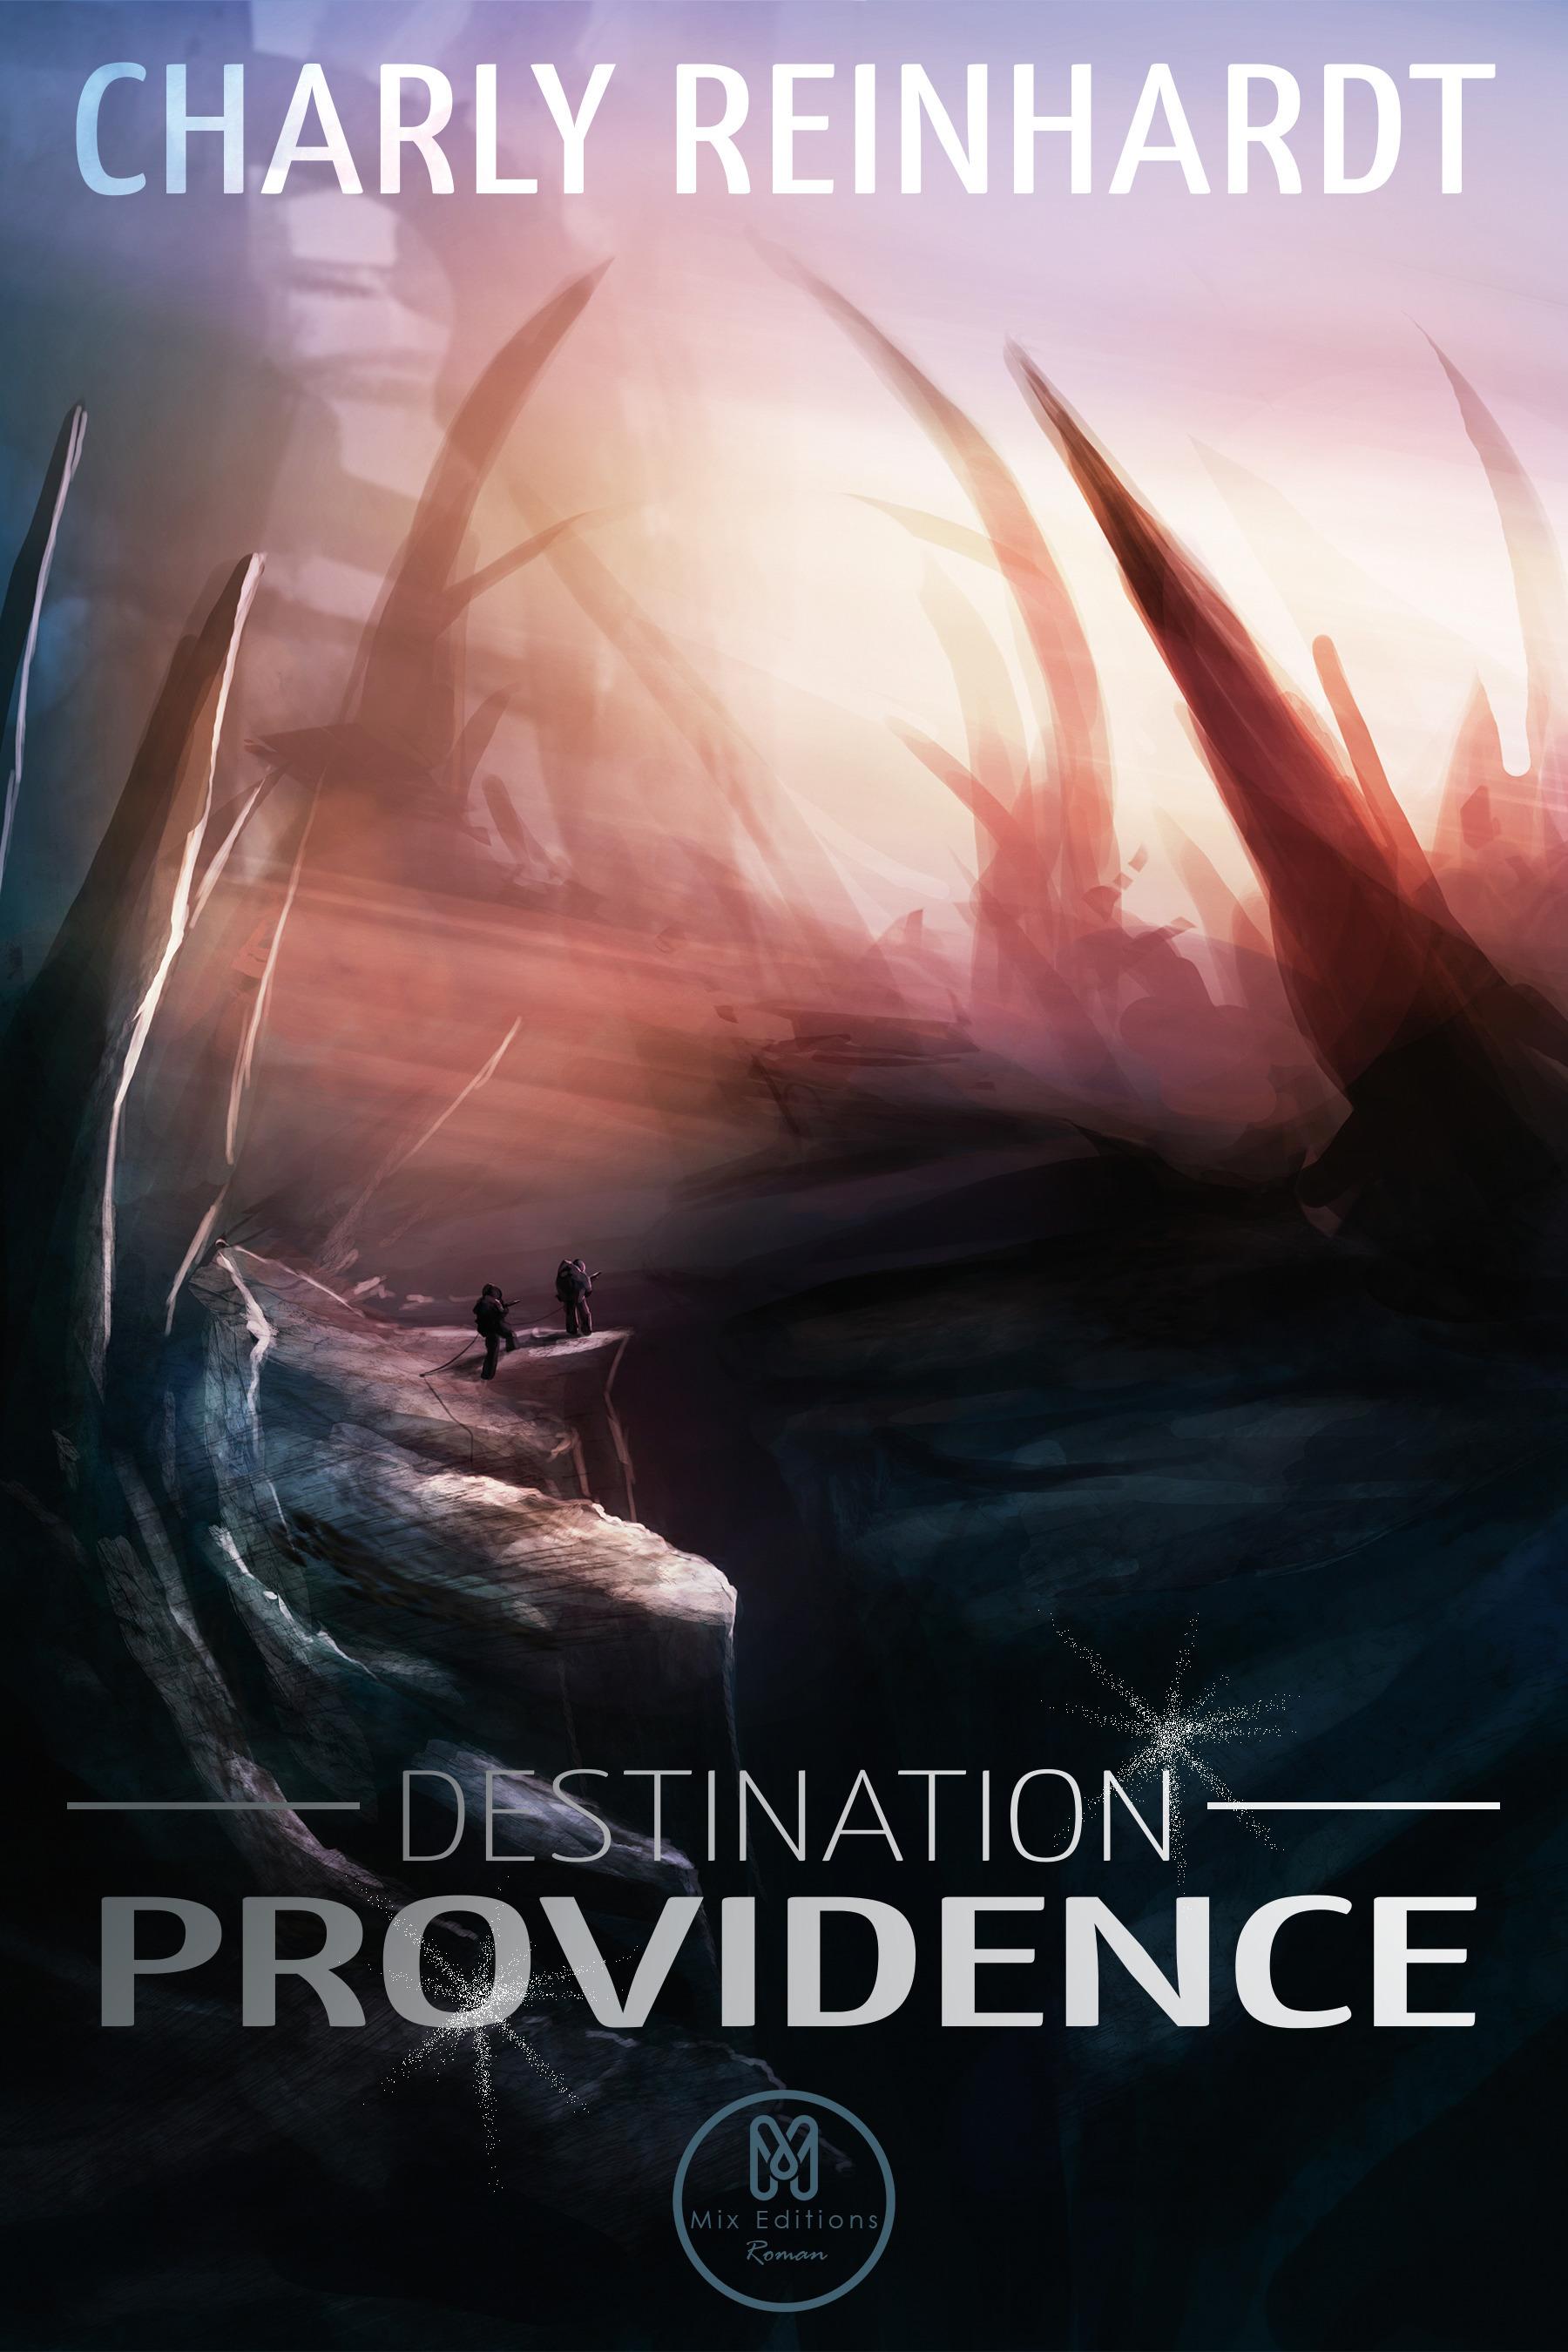 Destination Providence